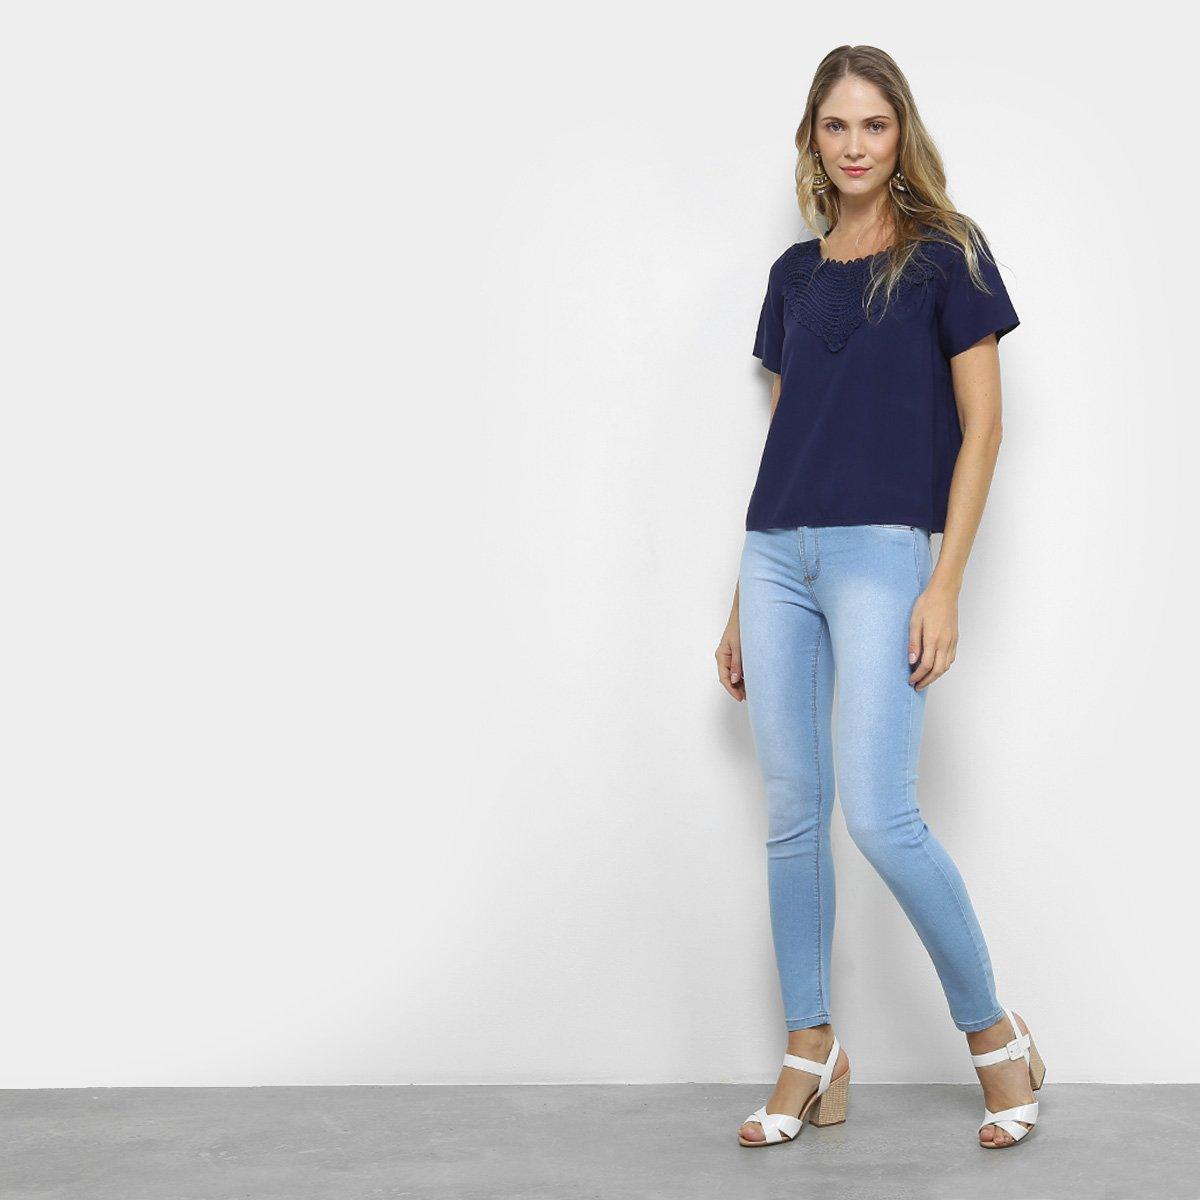 Estonada Calça Jeans Feminina Média Claro Sawary Azul Cintura Cigarrete pqqxBPtwz